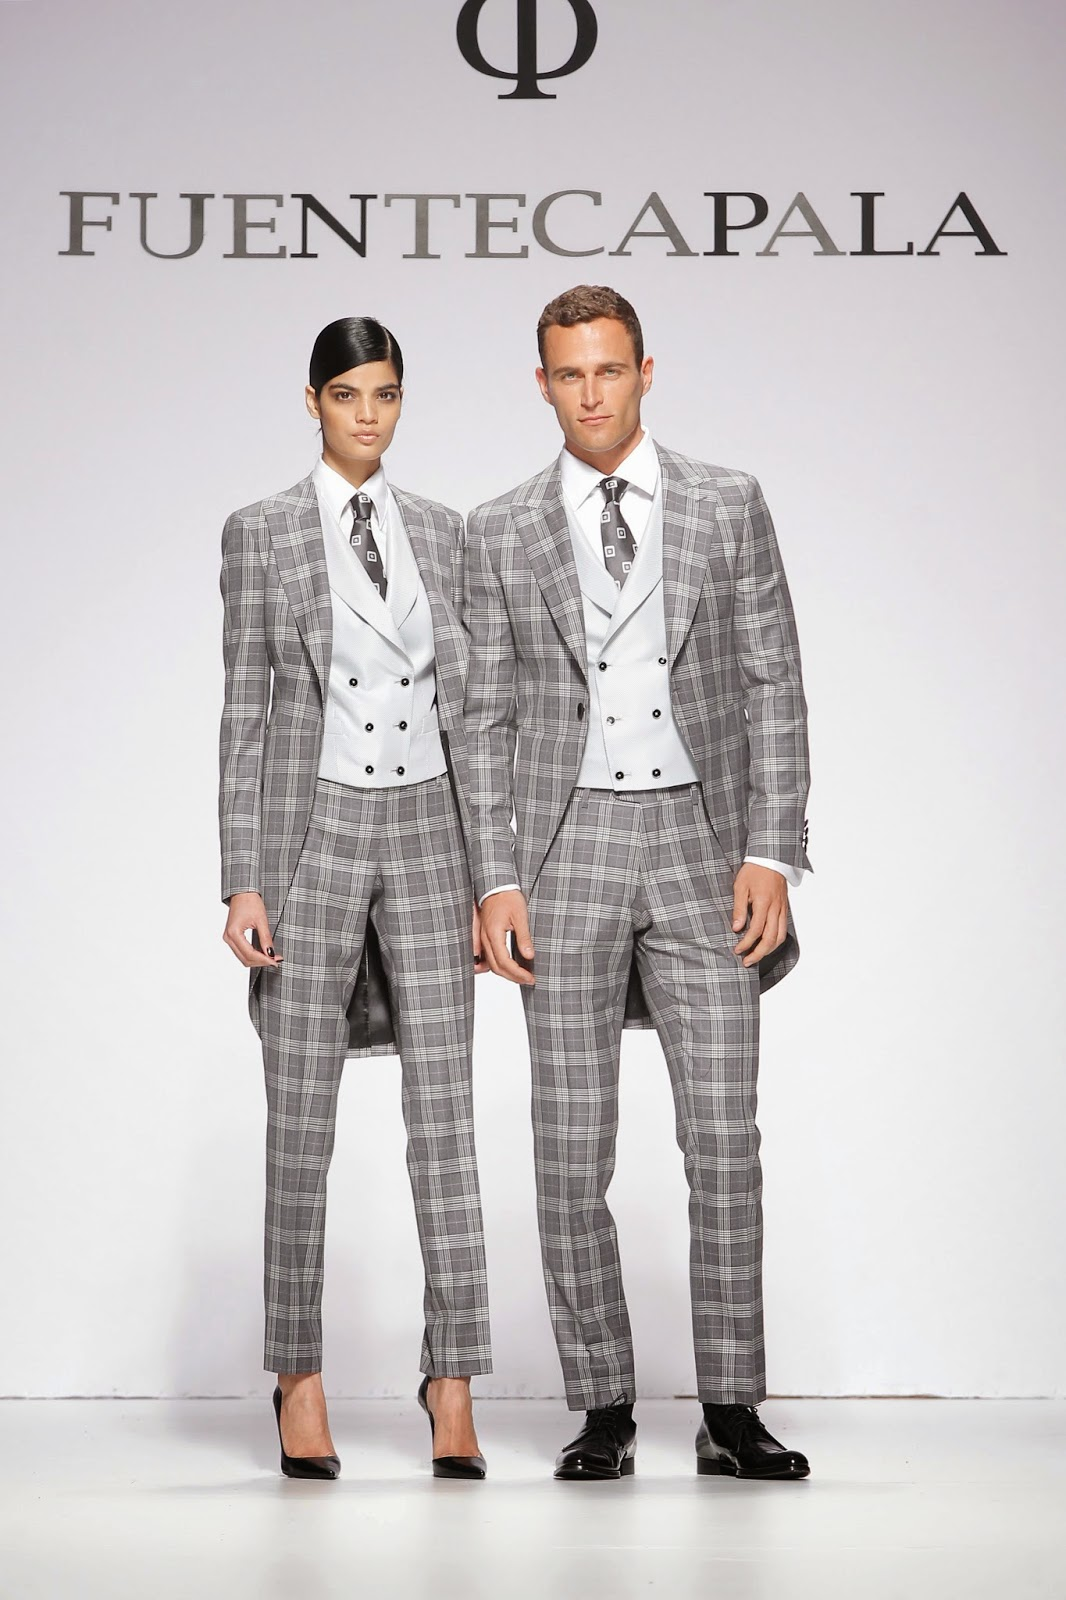 Especial Novios, moda ceremonia, novios, Novios 2015, Suits and Shirts, Zero Protocol,